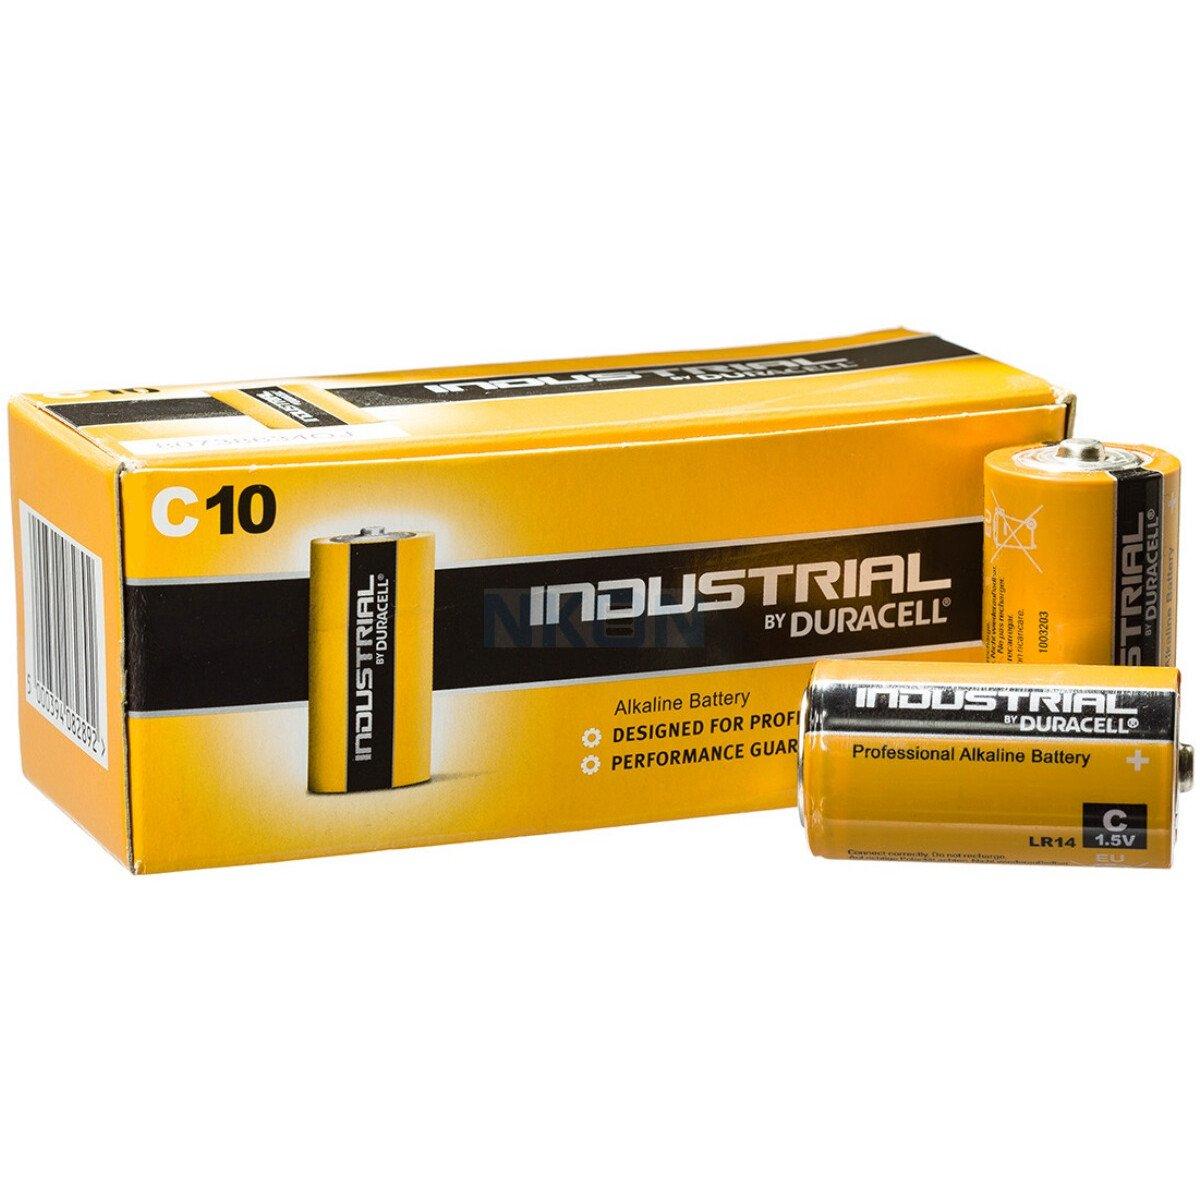 Duracell 1400 'C' Type Industrial/Procell LR14 Alkaline Batteries (Each)